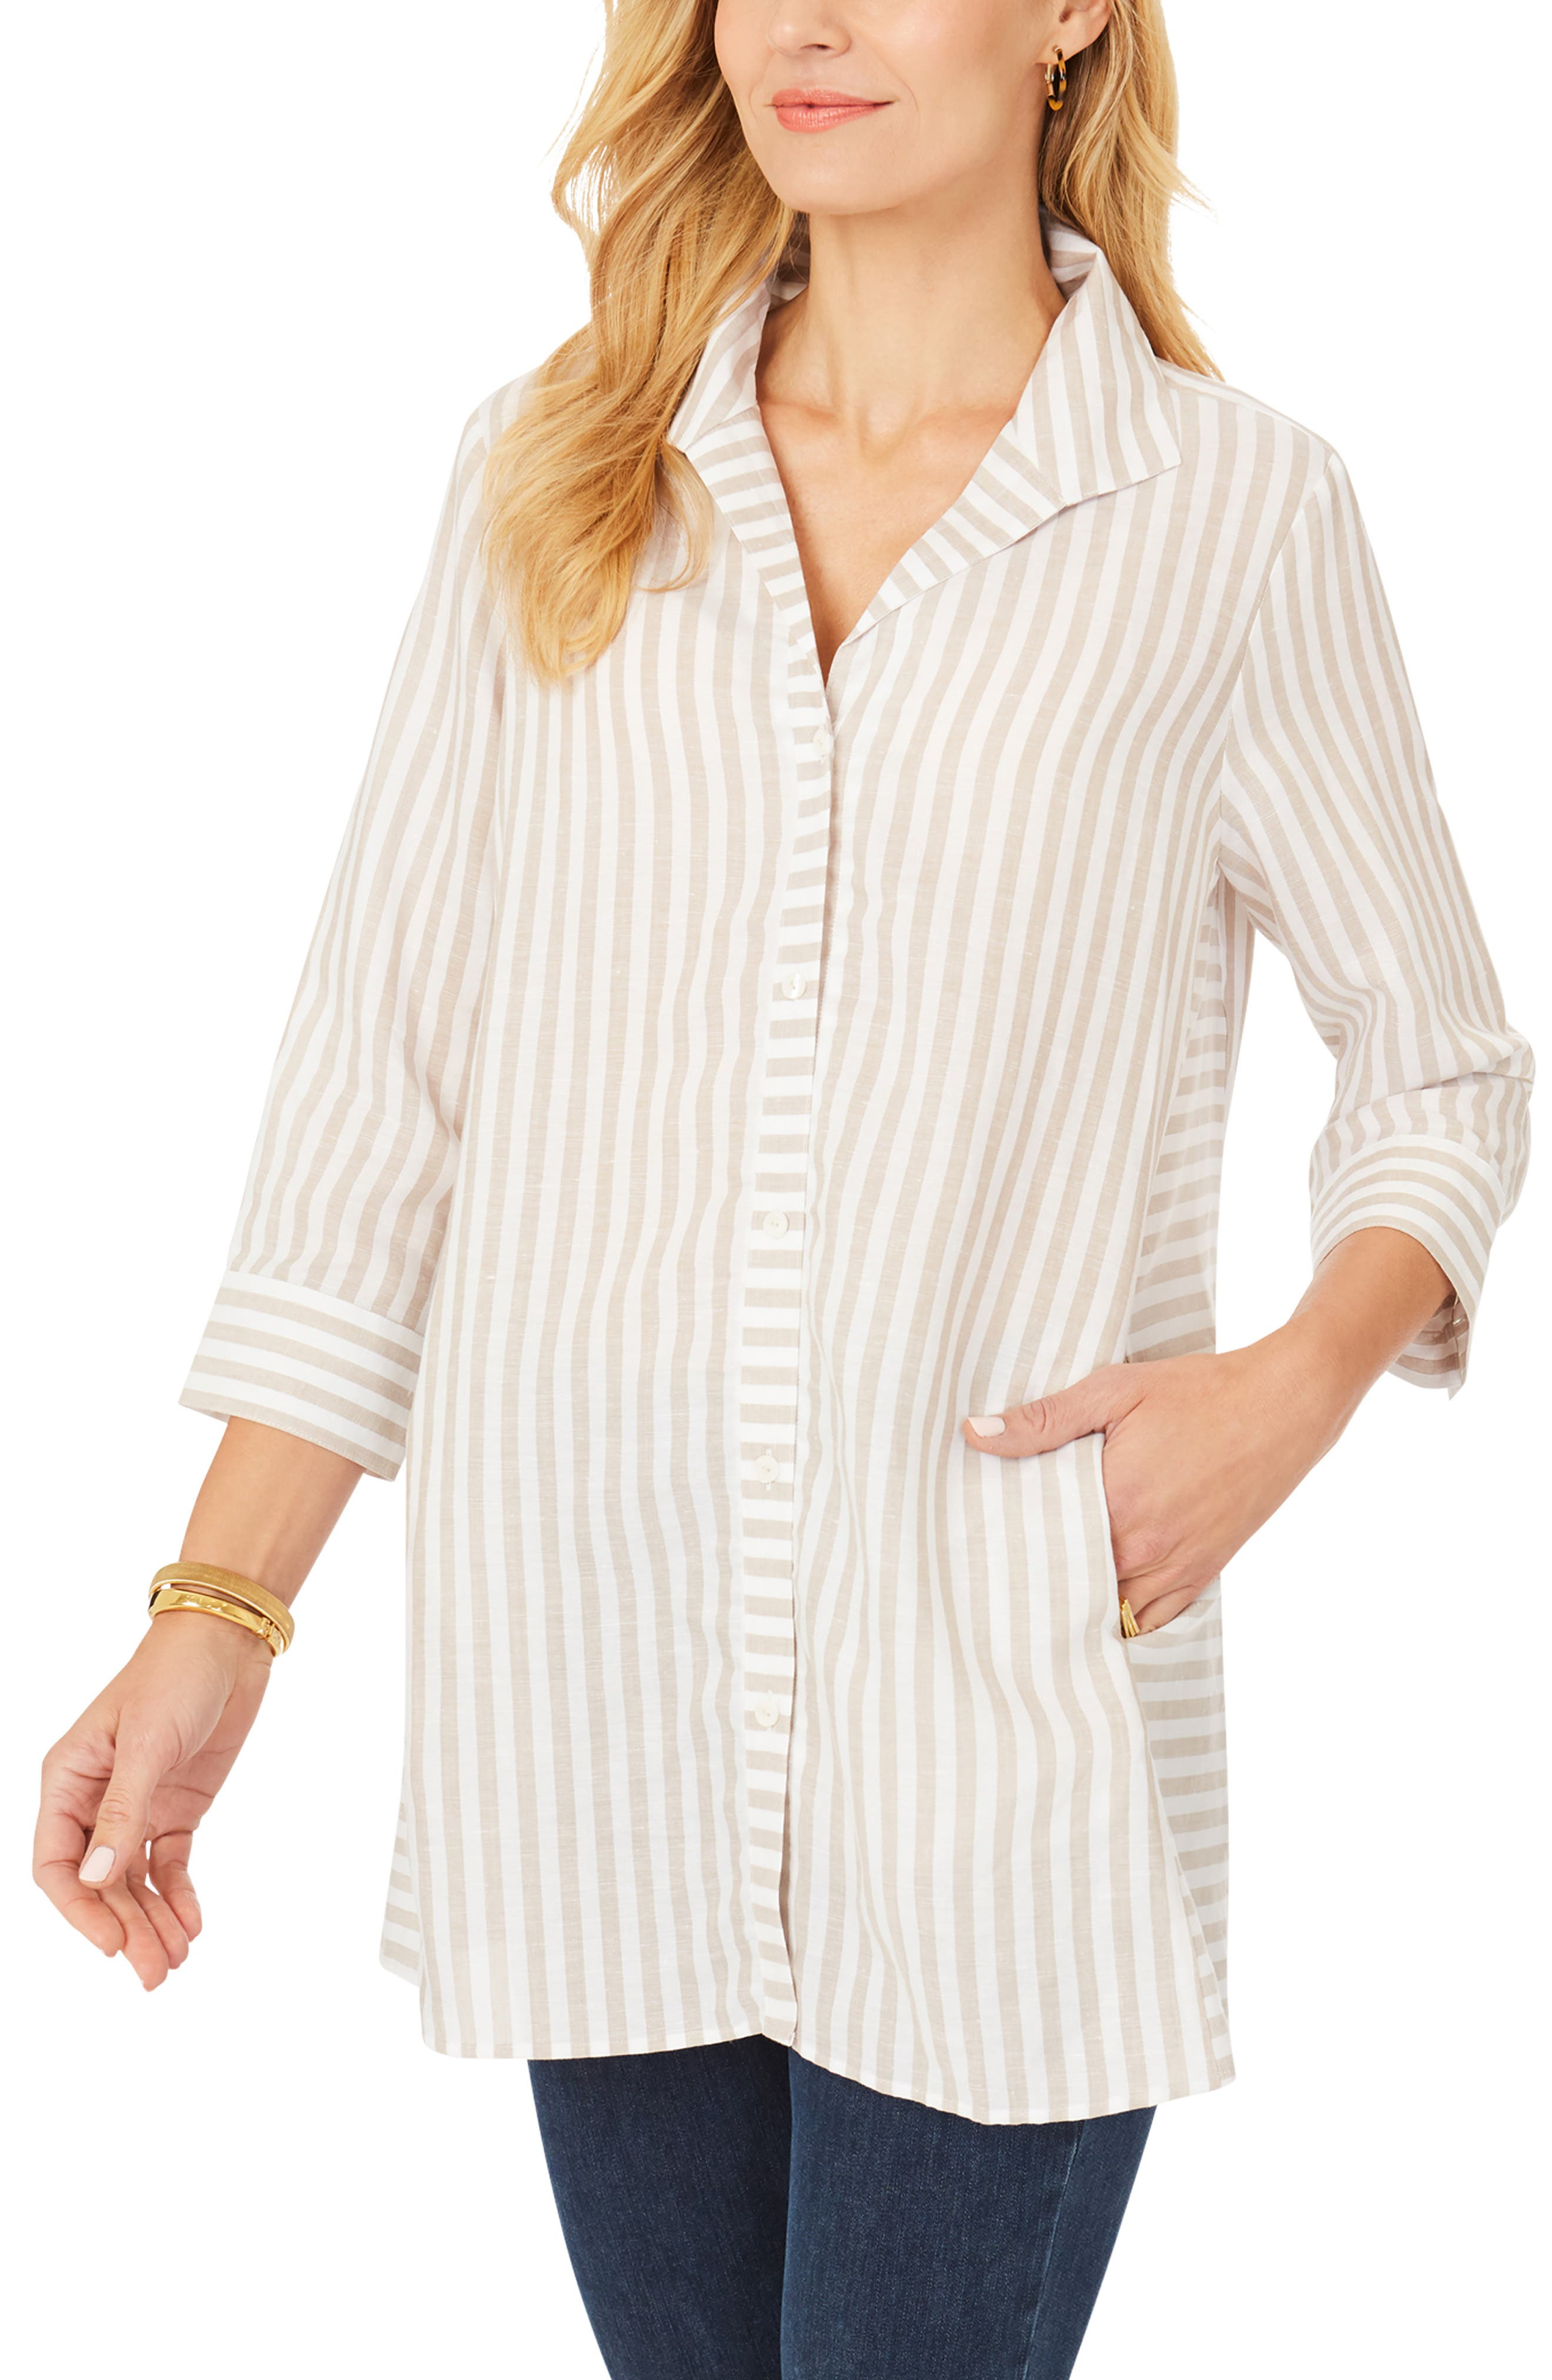 Soraya Stripe Button-Up Top